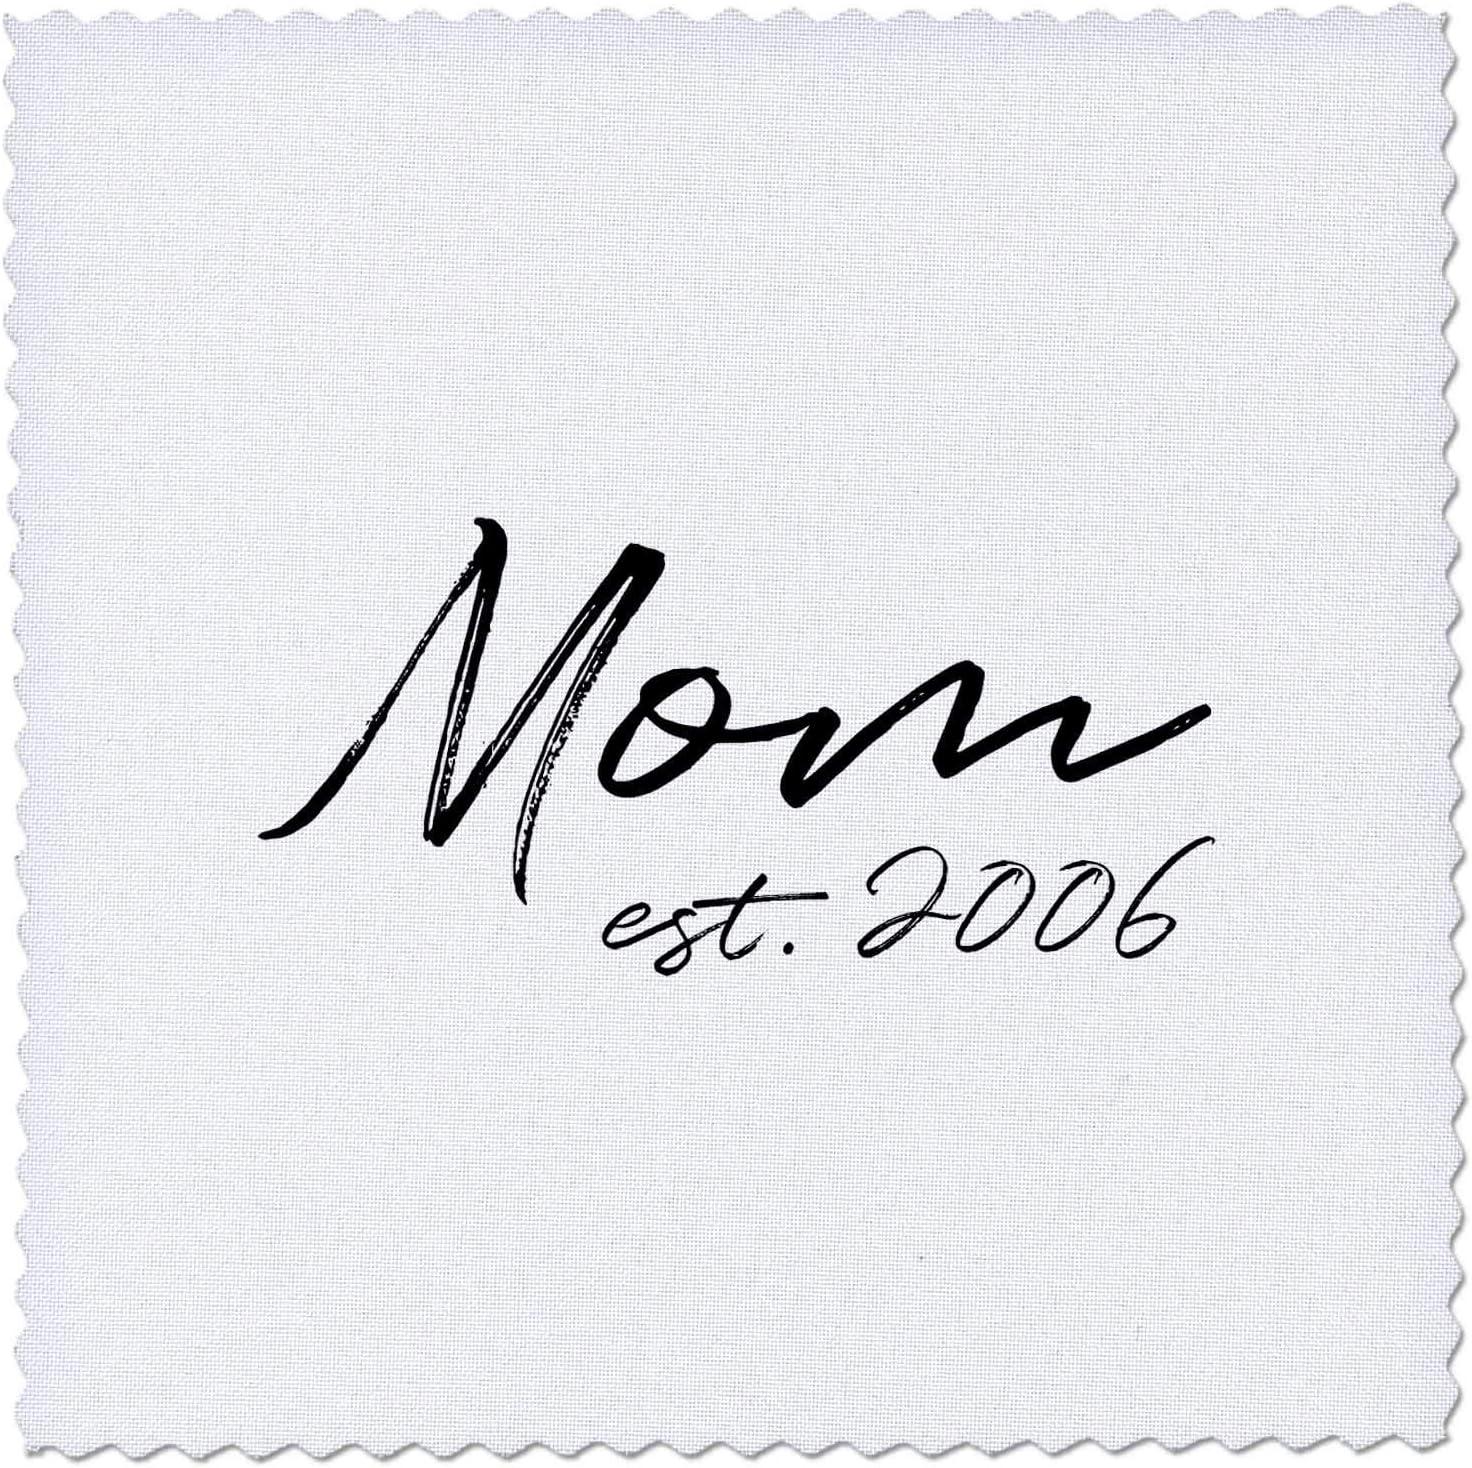 Superior 3dRose Mom established 2006. Black felt lettering Ranking TOP14 white. pen on